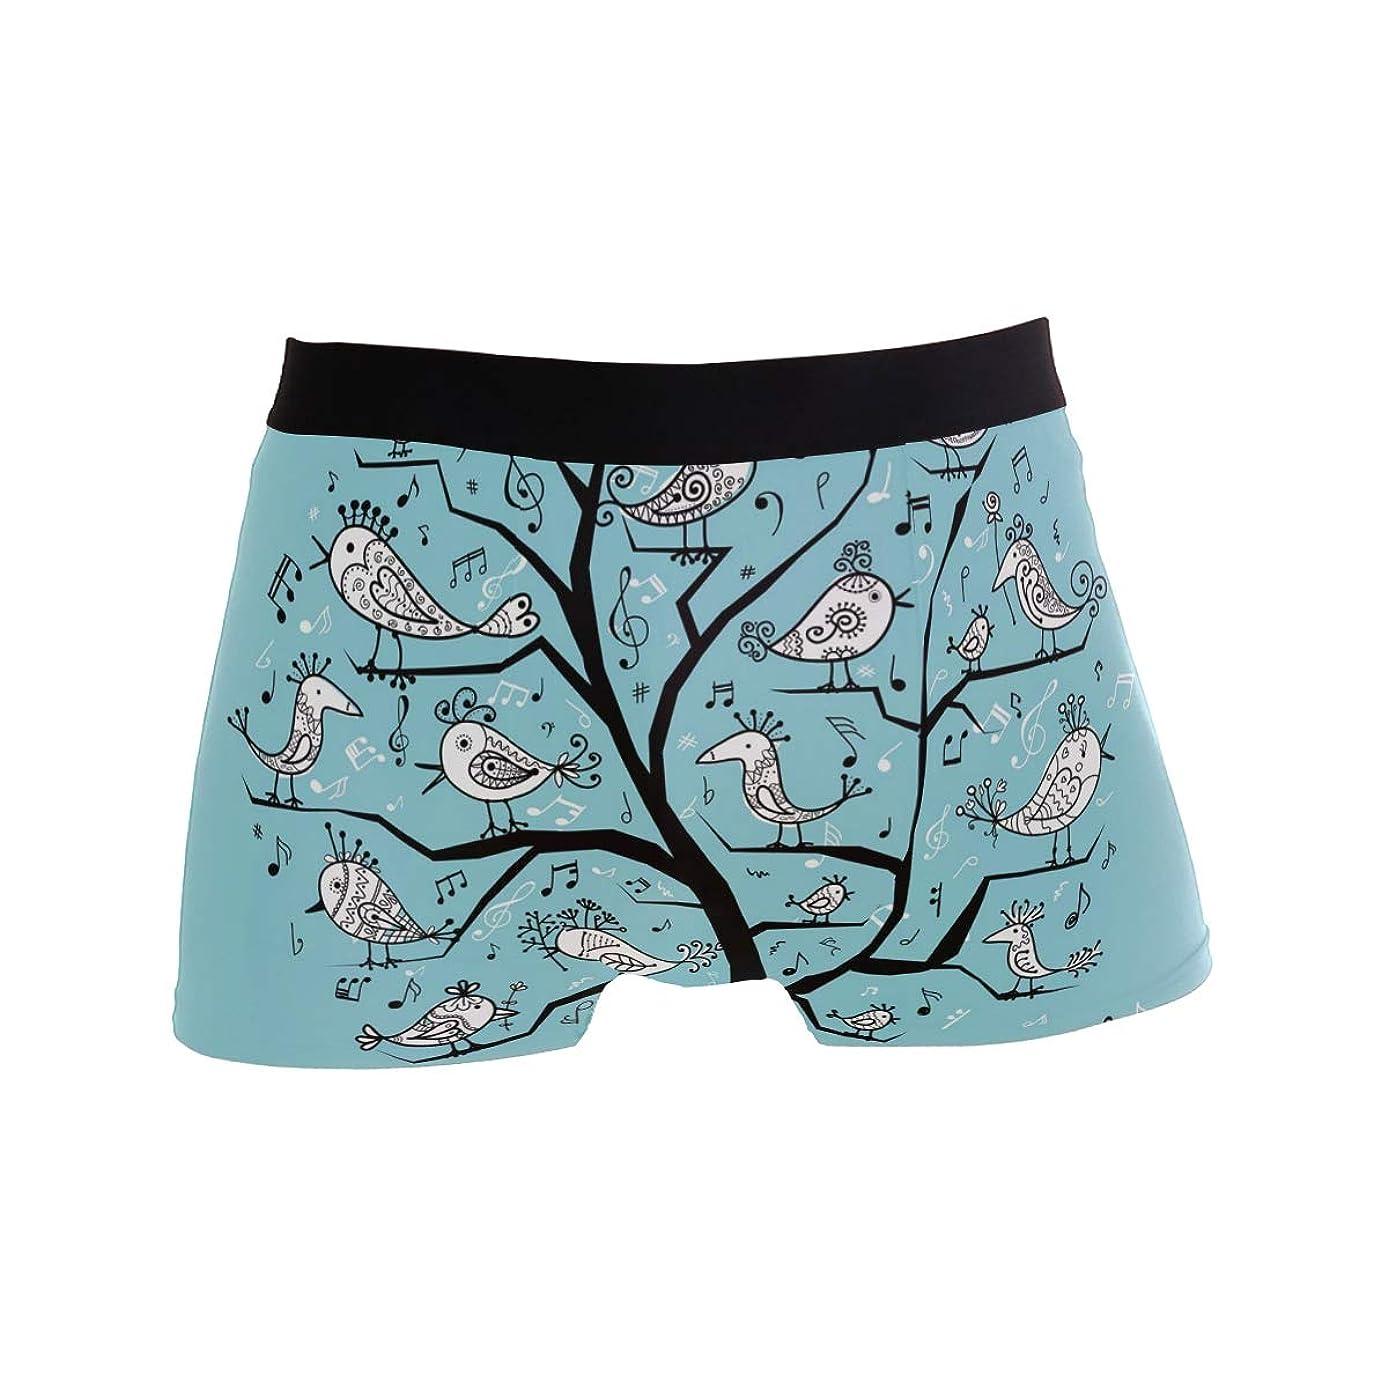 Cartoon Singing Birds Tree Men's Boxer Briefs Regular Soft Breathable Comfortable Underwear